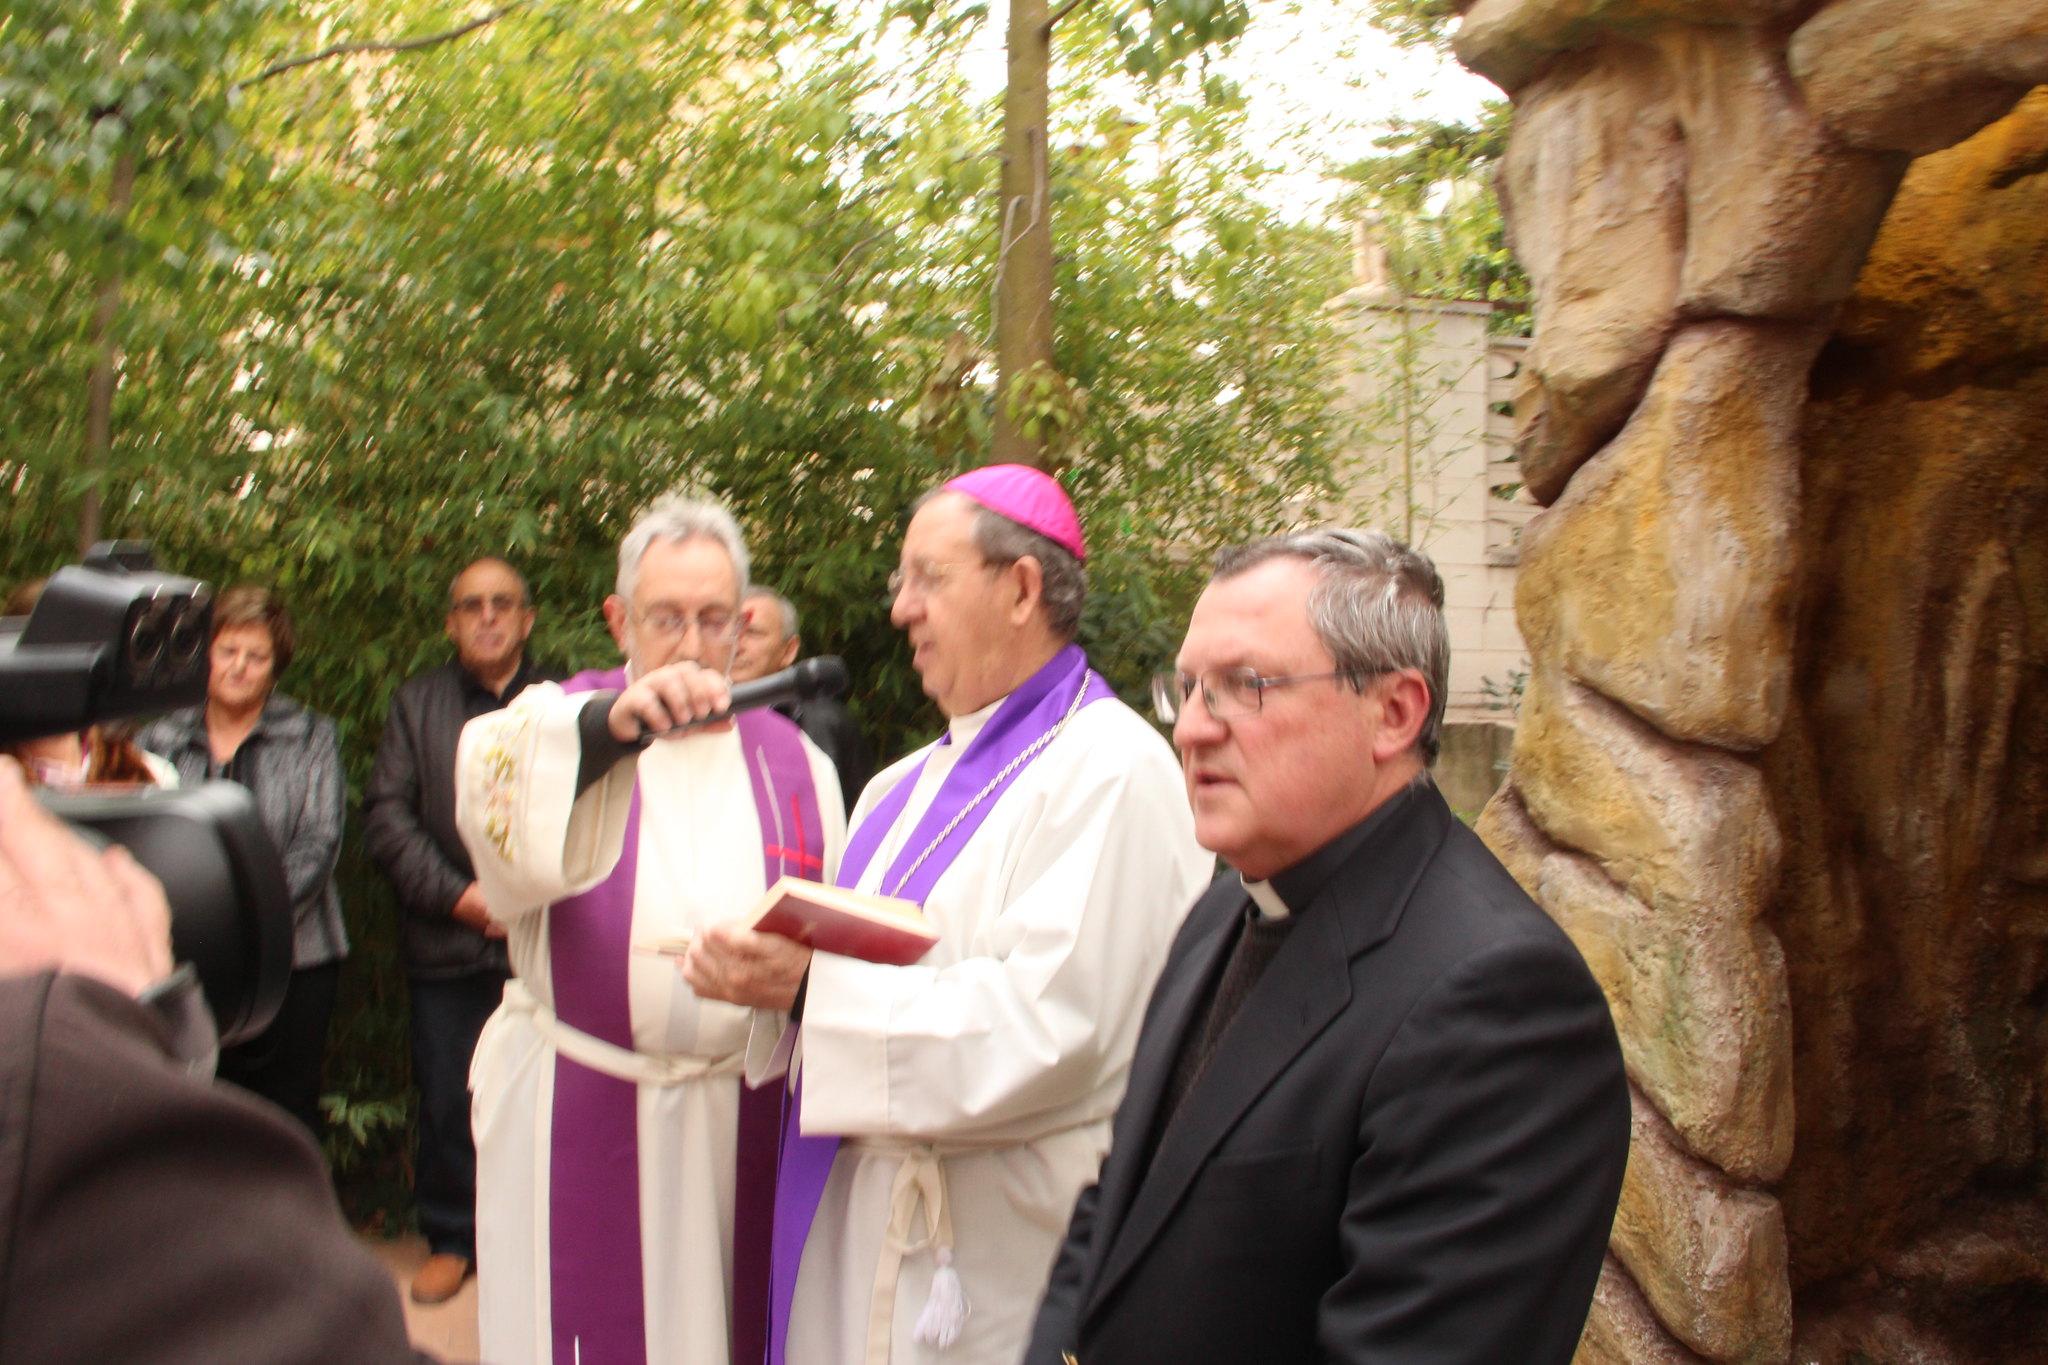 (2016-02-13) - Inauguración Virgen De Lourdes, La Molineta - Archivo La Molineta (073)